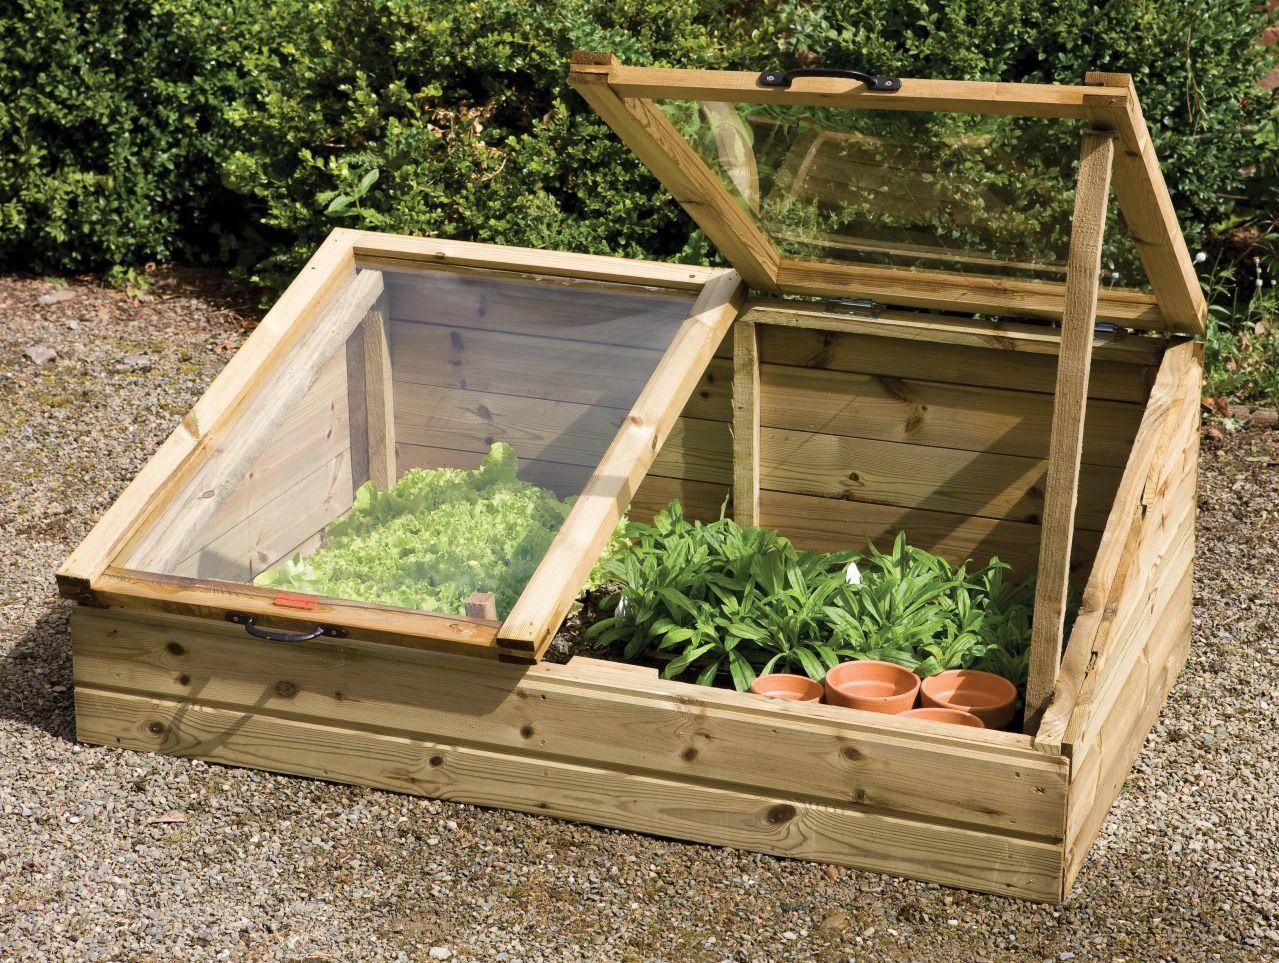 Mini Greenhouse | There is no place like home | Pinterest | Mini ...